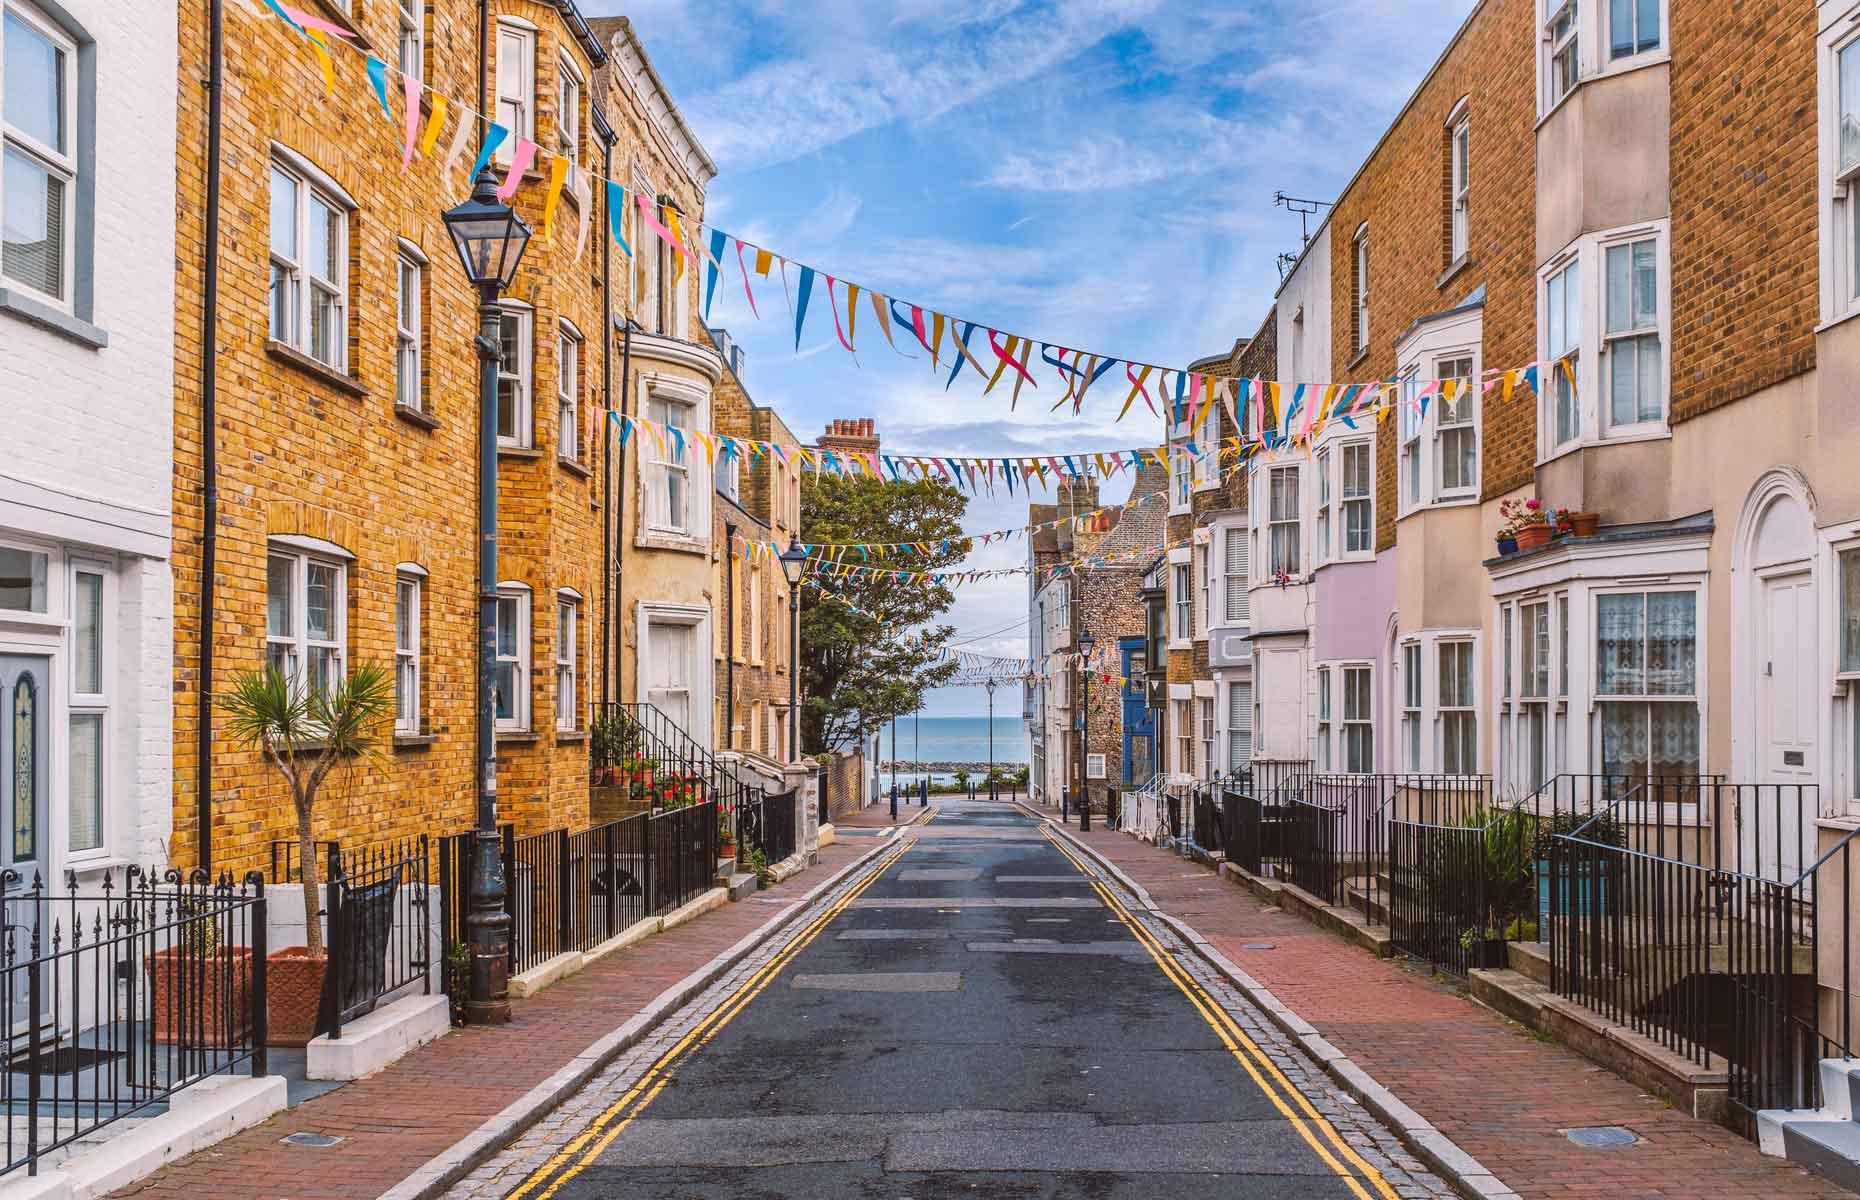 Street in Ramsgate (Image: Christine Bird/Shutterstock)